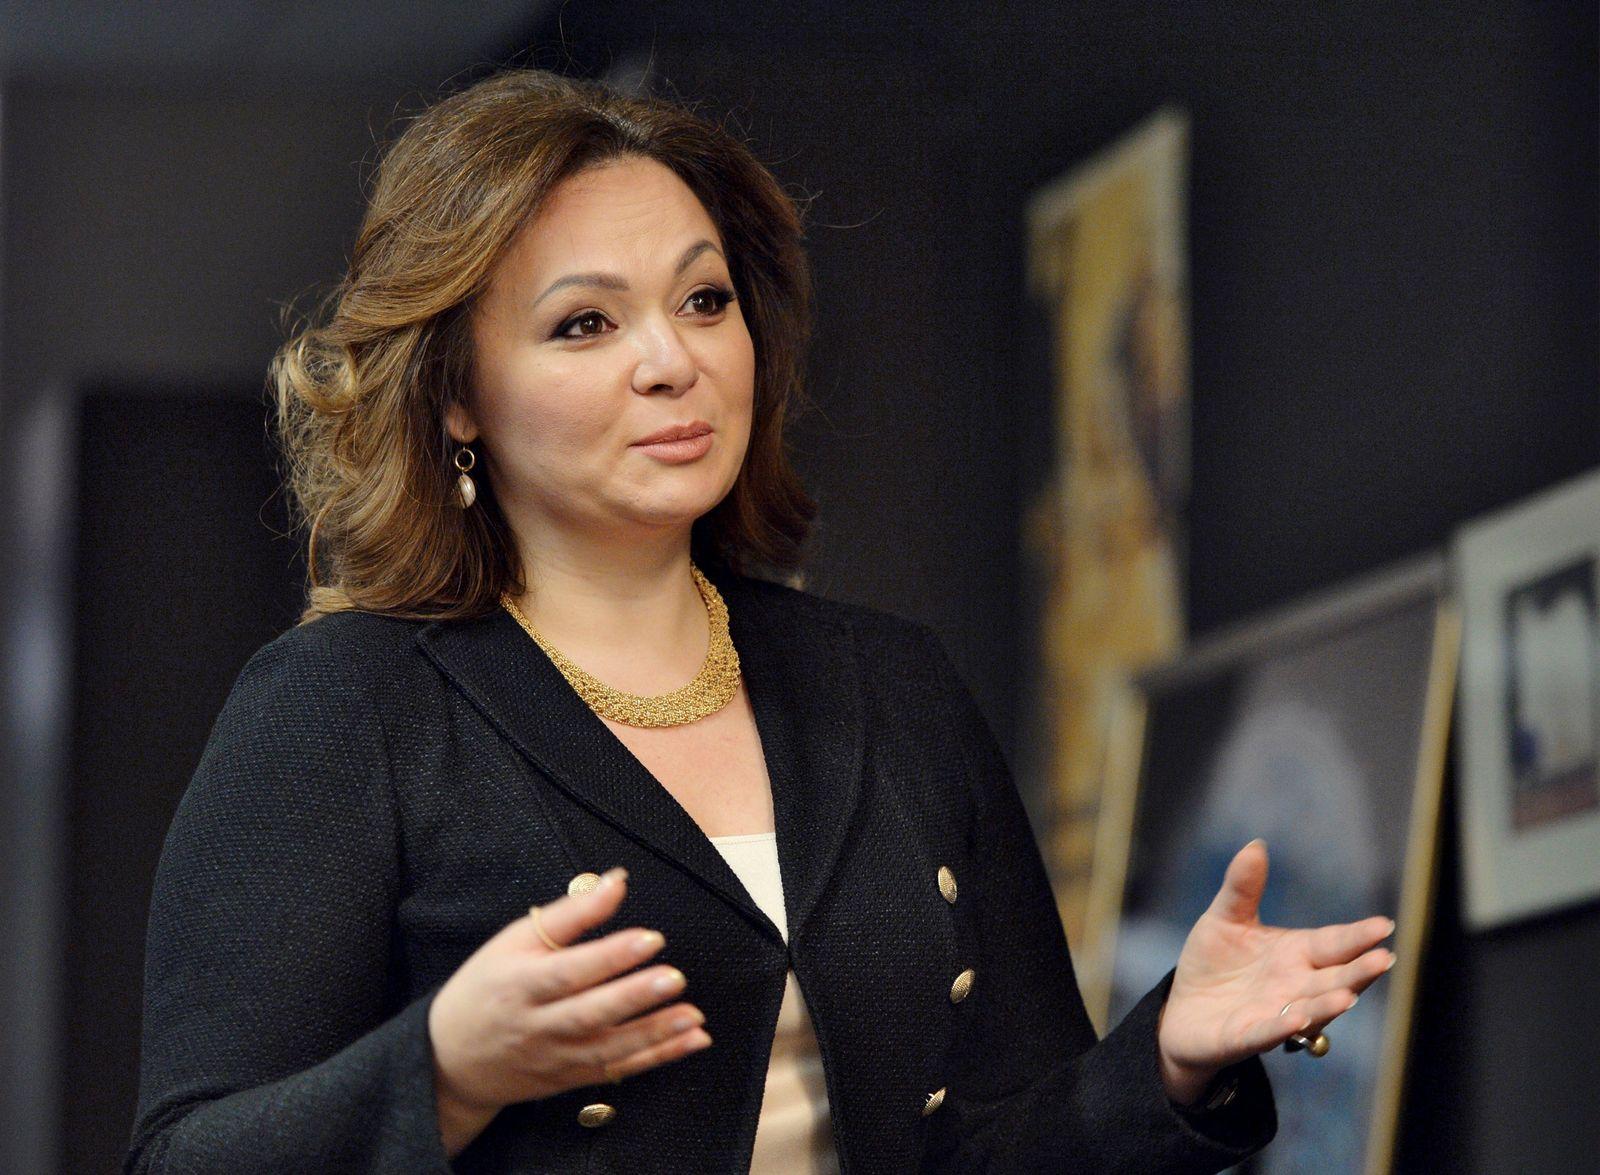 EINMALIGE VERWENDUNG Natalia Wesselnizkaja